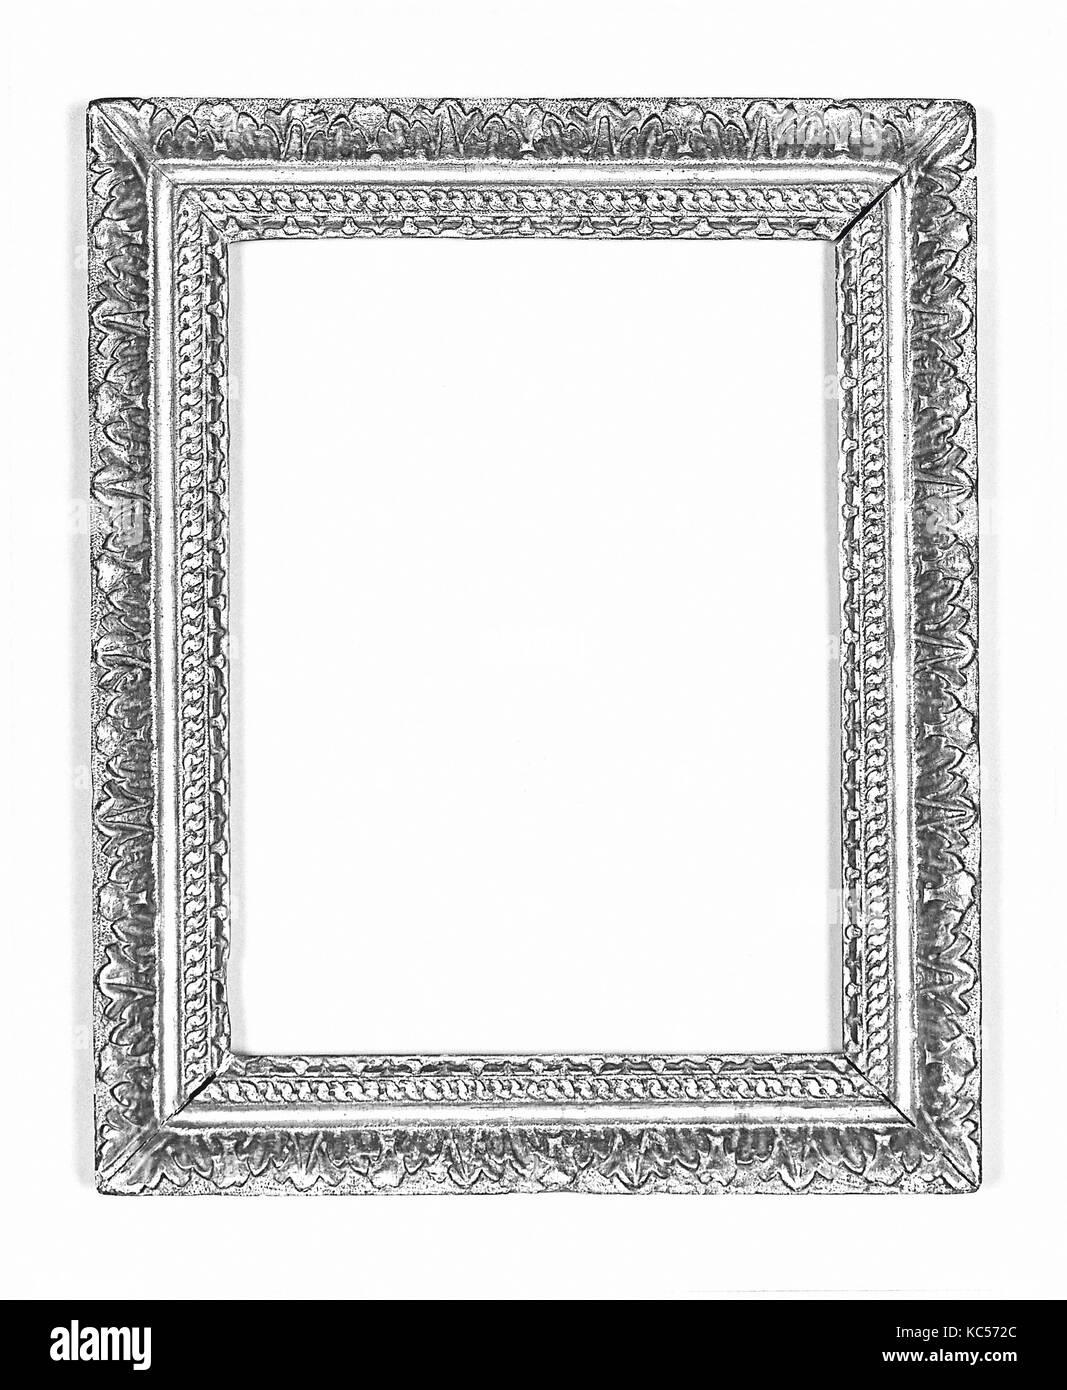 Ovolo Frame Stock Photos & Ovolo Frame Stock Images - Alamy